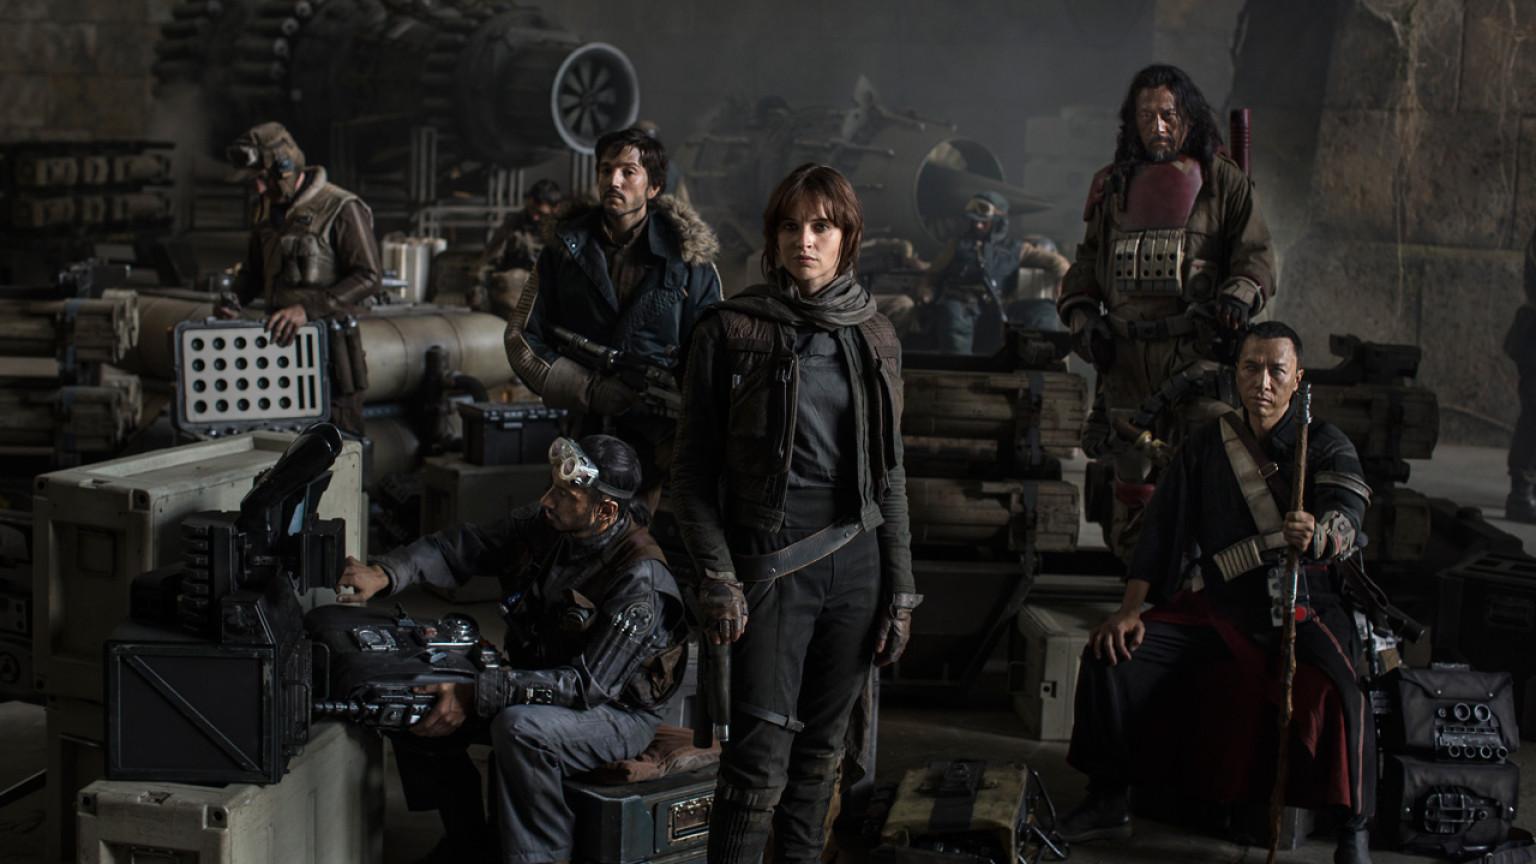 Rogue one movie group photos